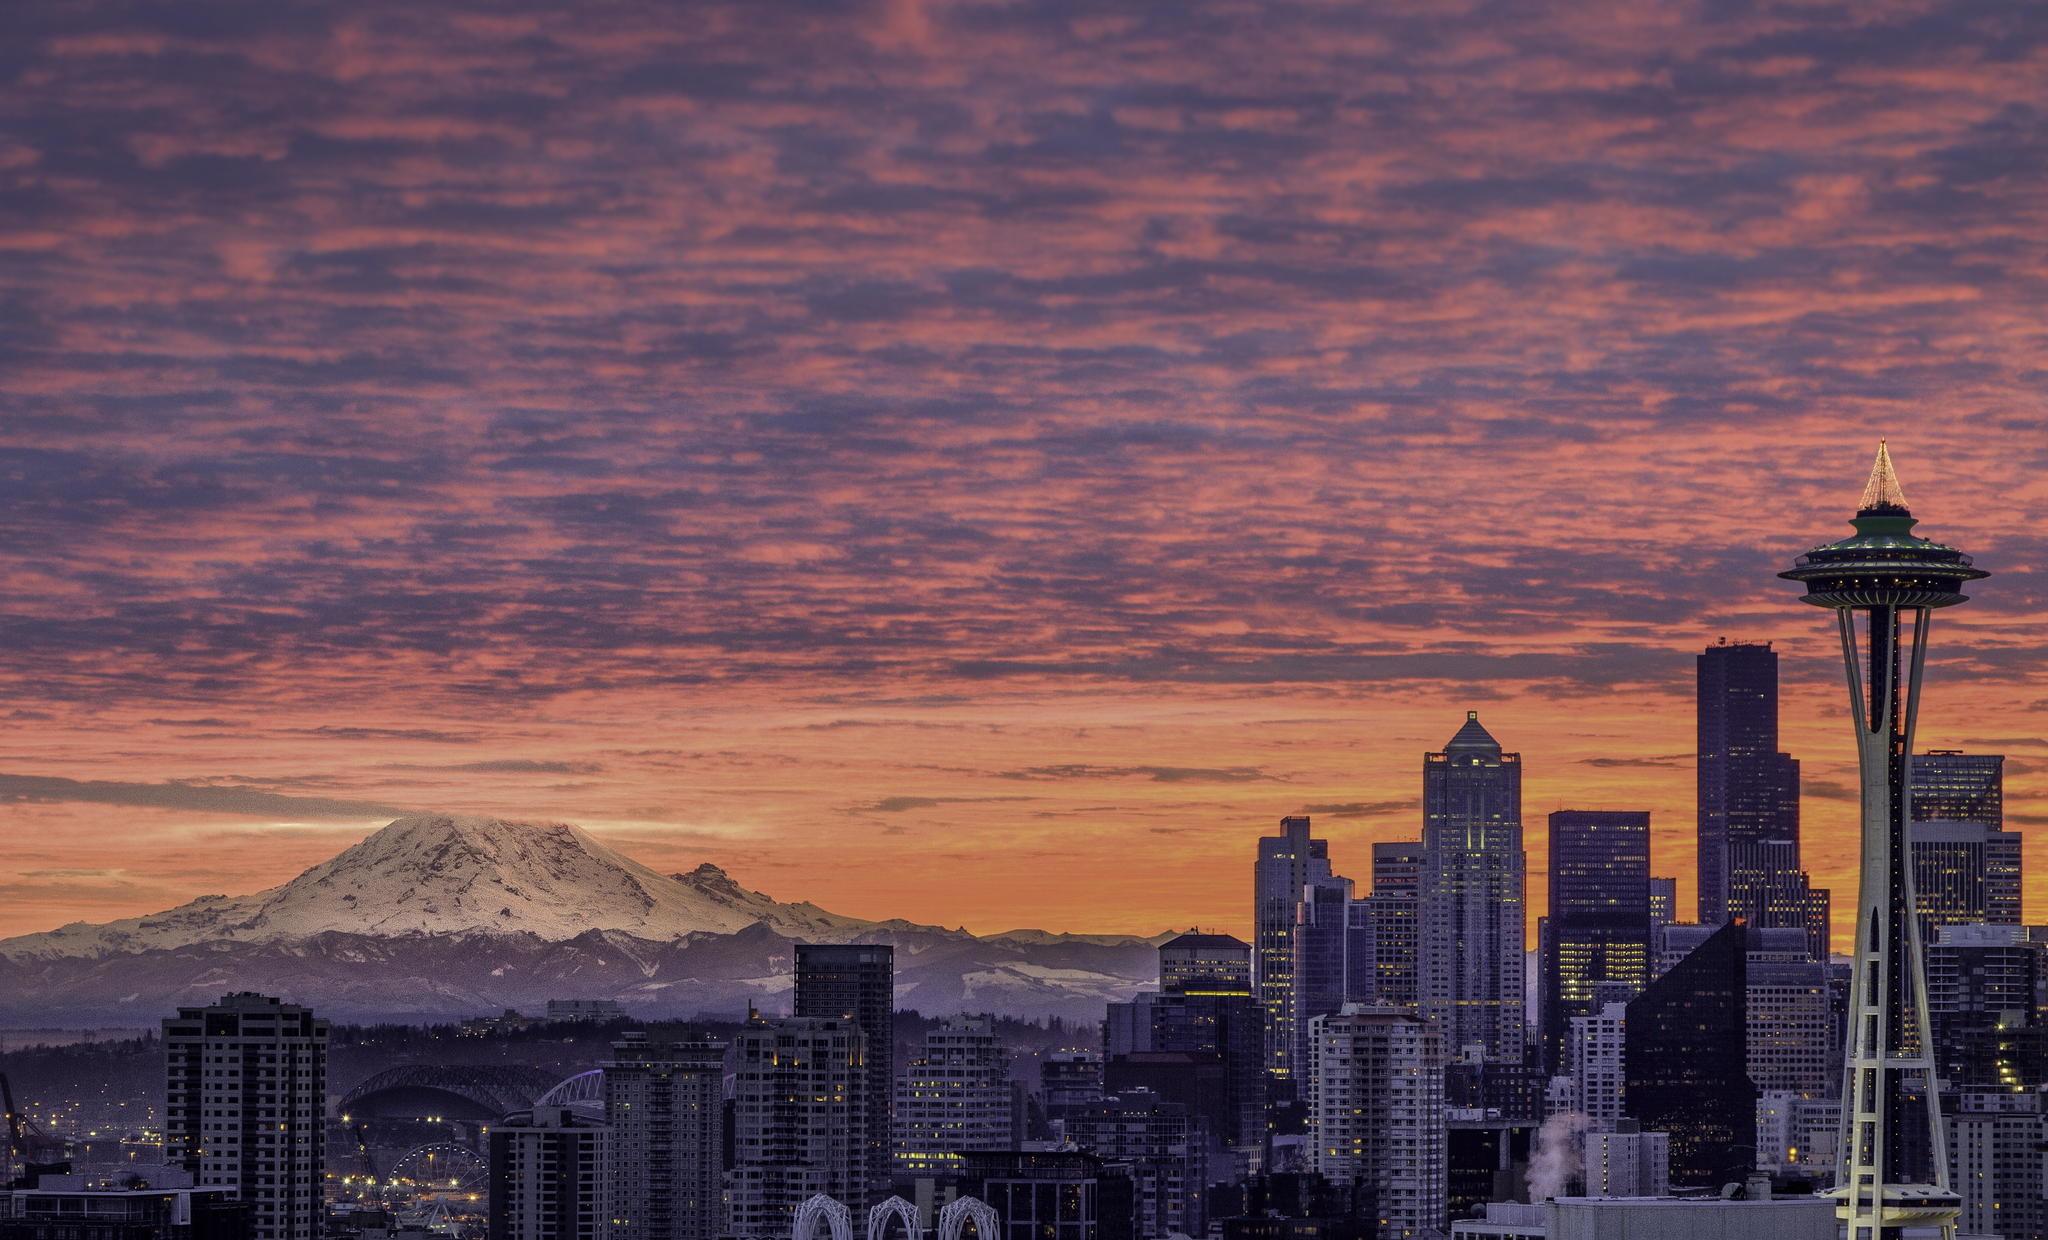 Seattle Washington Fall Skyline Wallpaper Seattle Wallpapers Hd Wallpapers Pulse